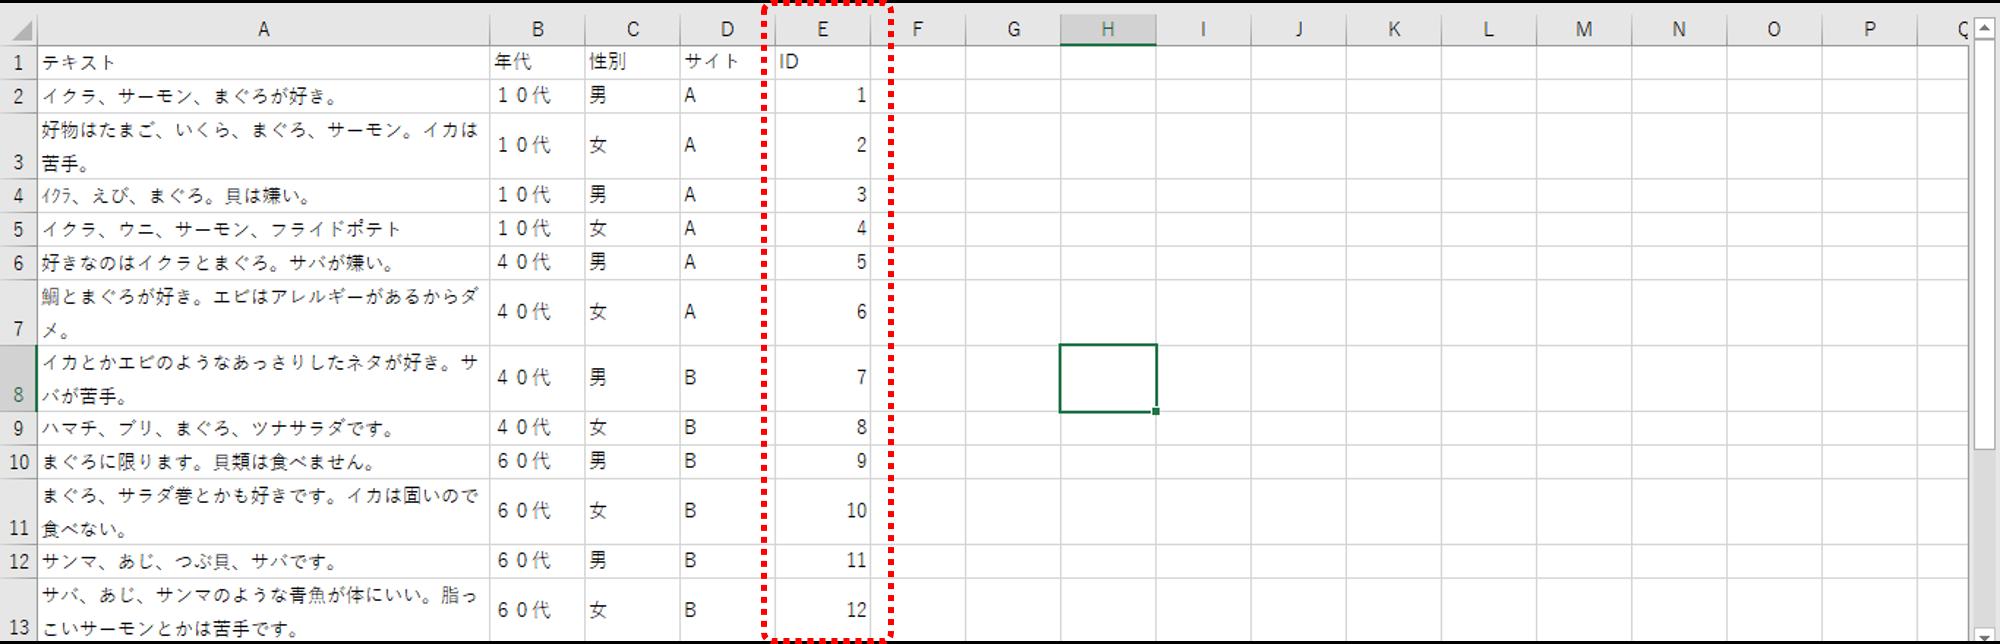 KHcoder 分析対象テキストID昇順